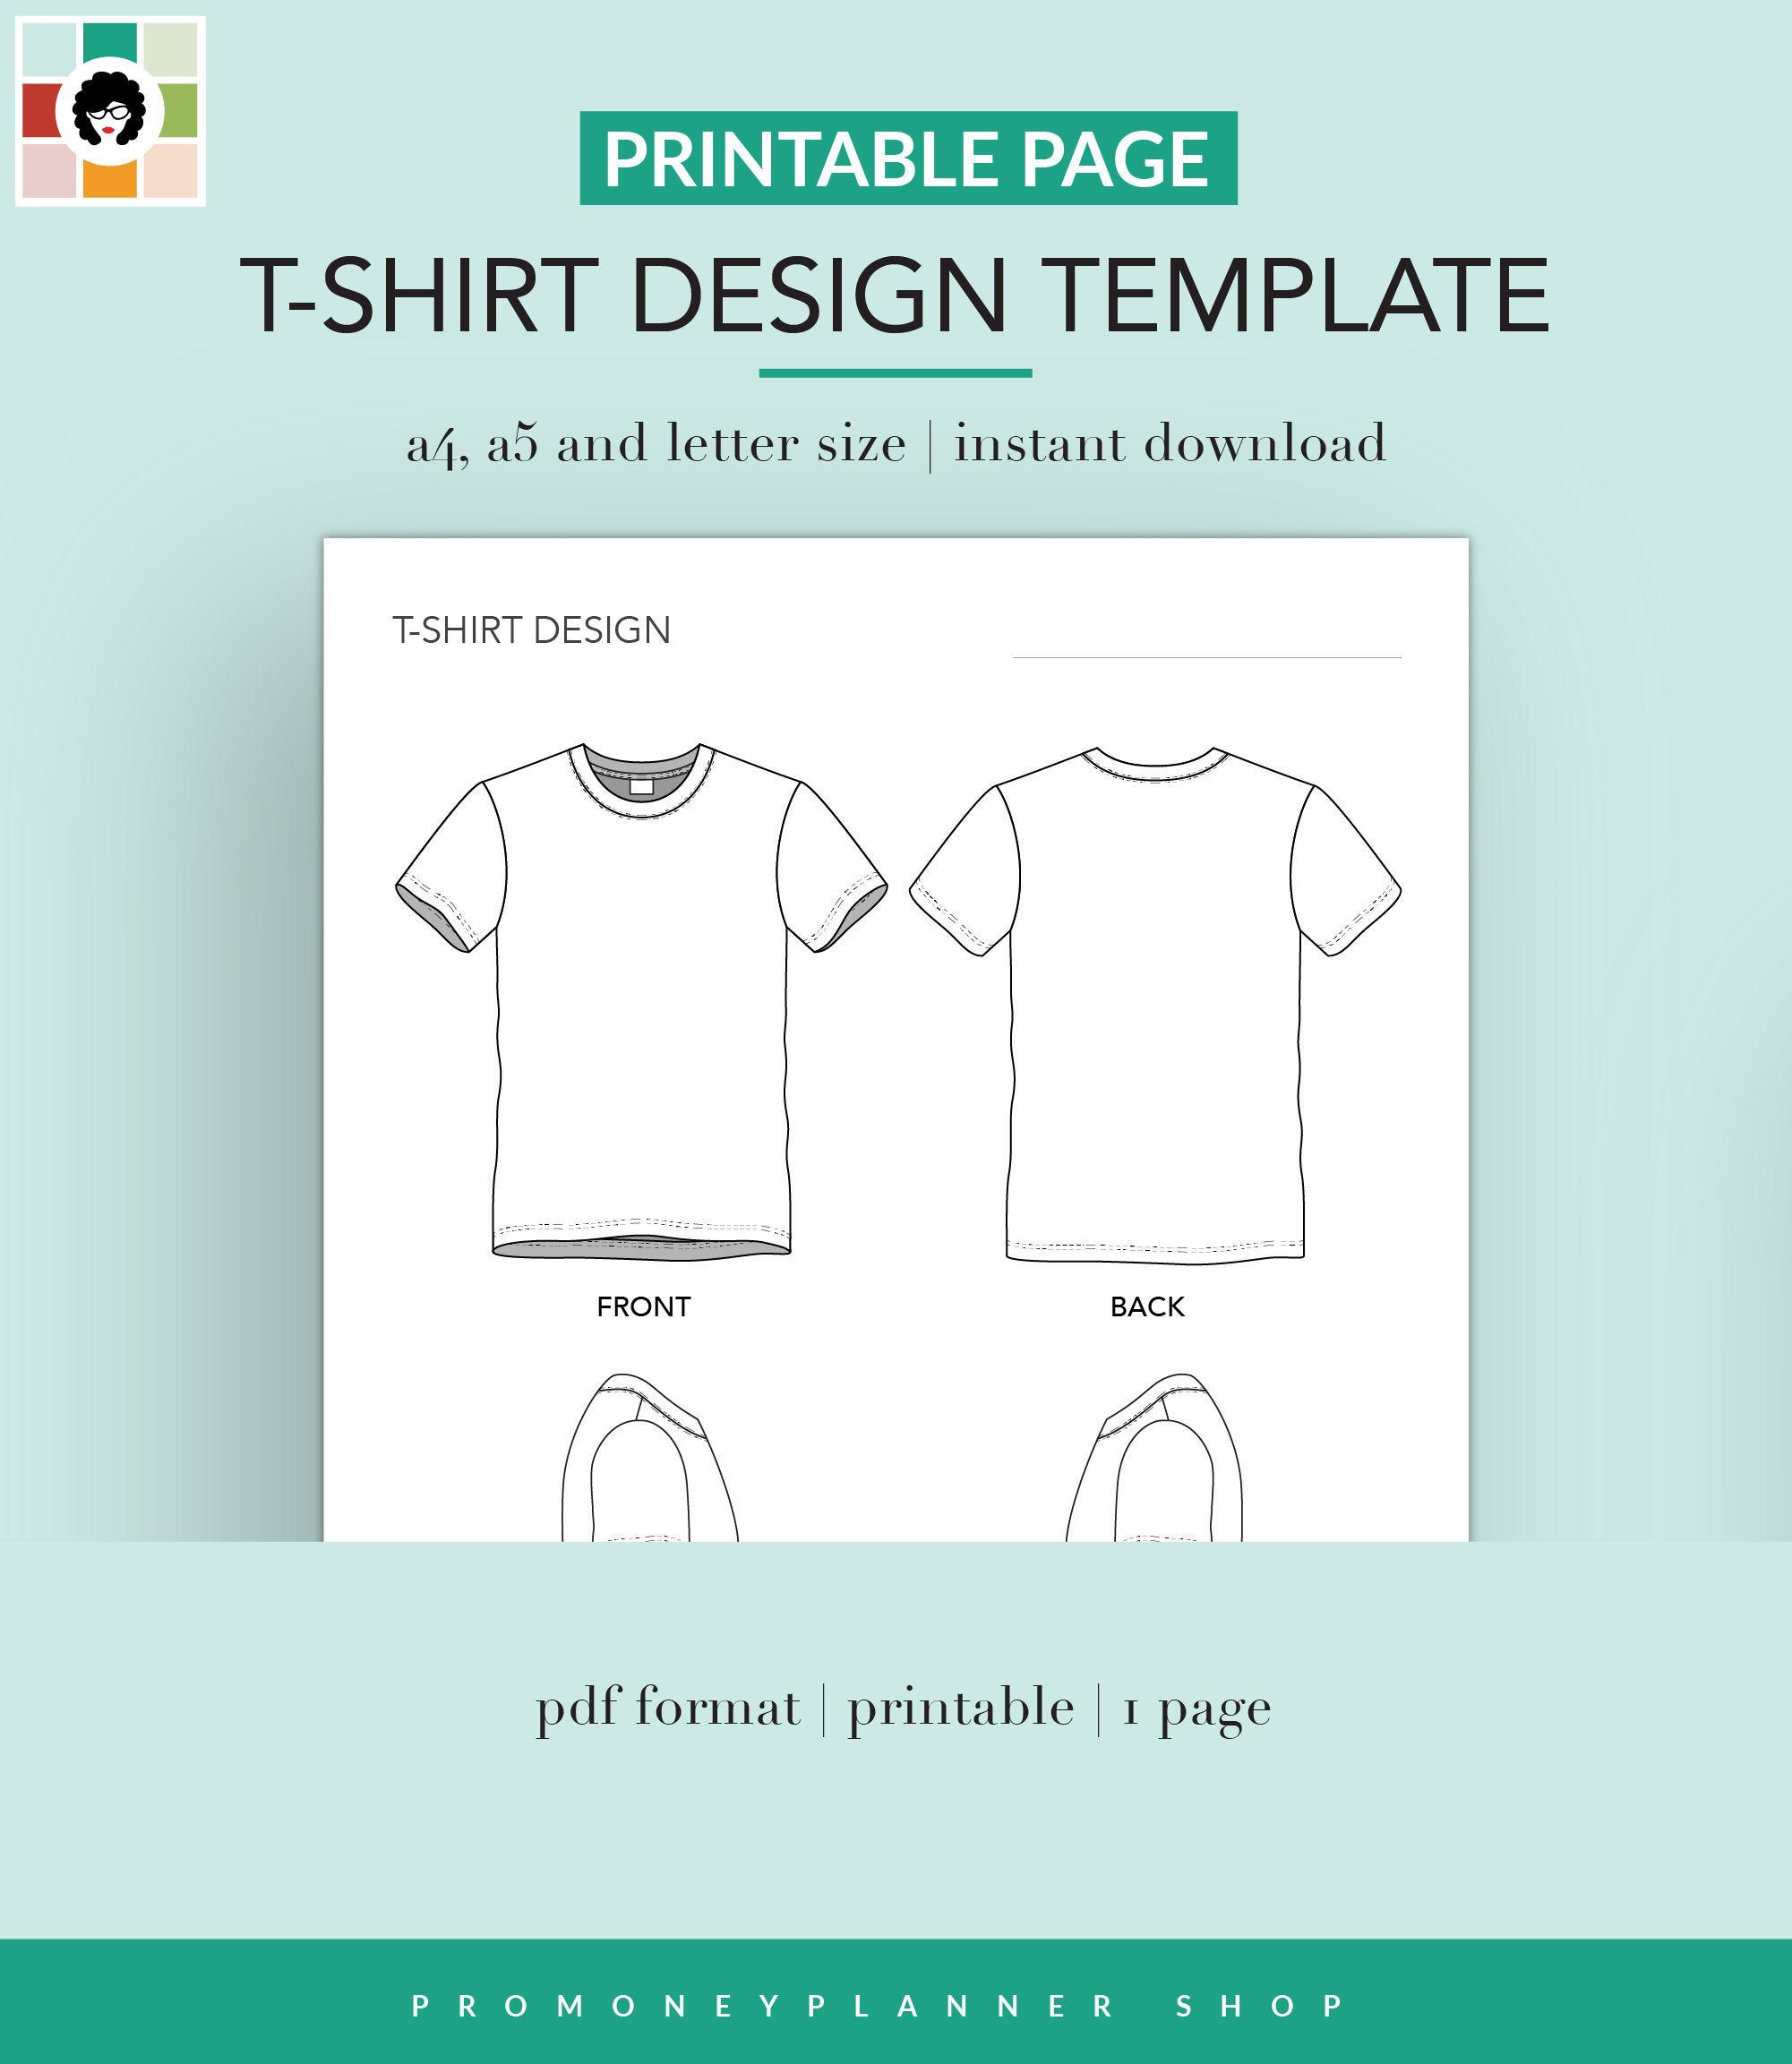 T Shirt Design Template Printable On Demand T Shirt Etsy T Shirt Design Template Design Your T Shirt Design Template